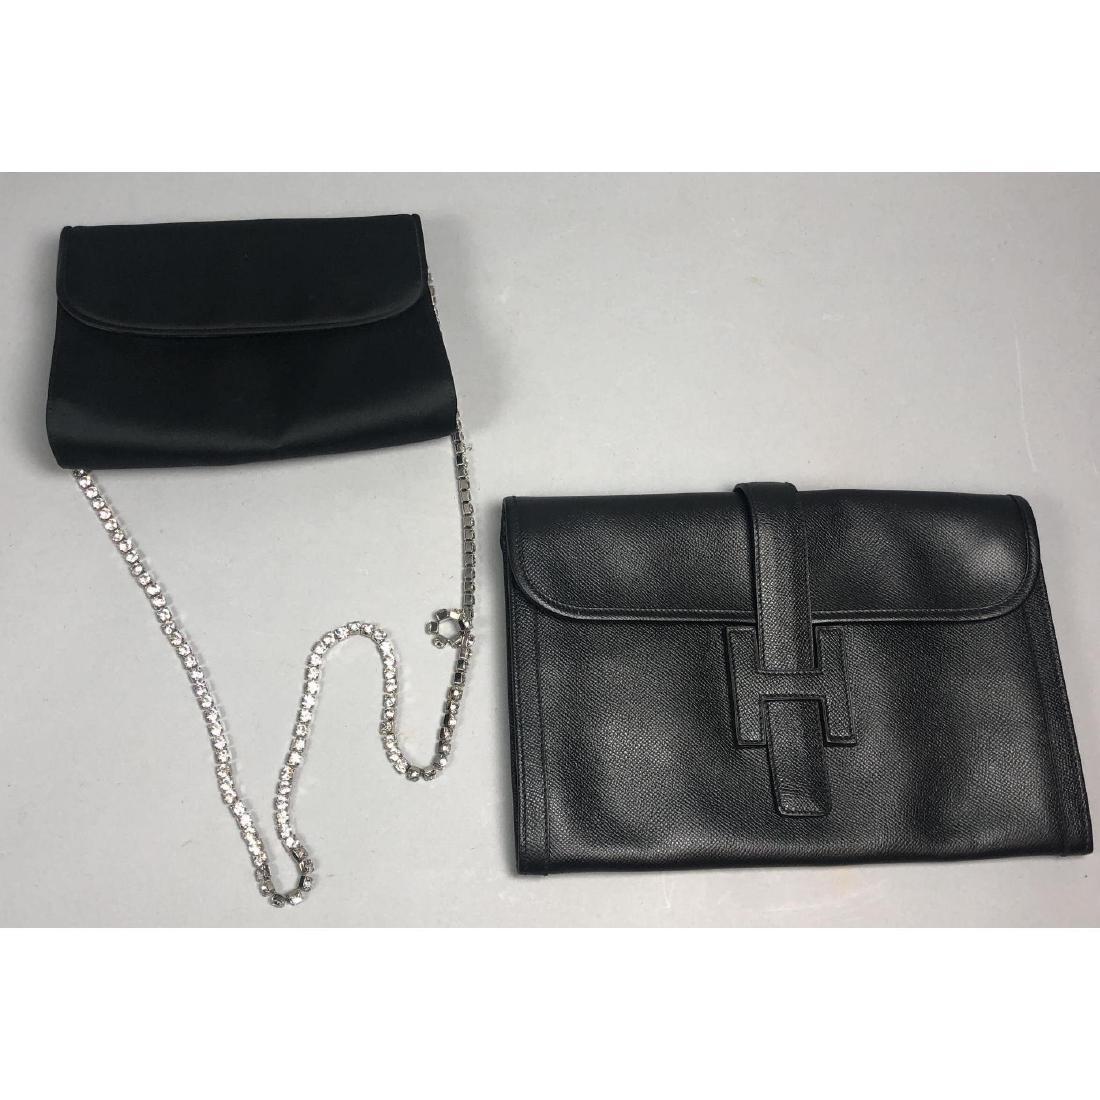 2pc Black Designer Handbag Purse Lot. GIVENCHY pe